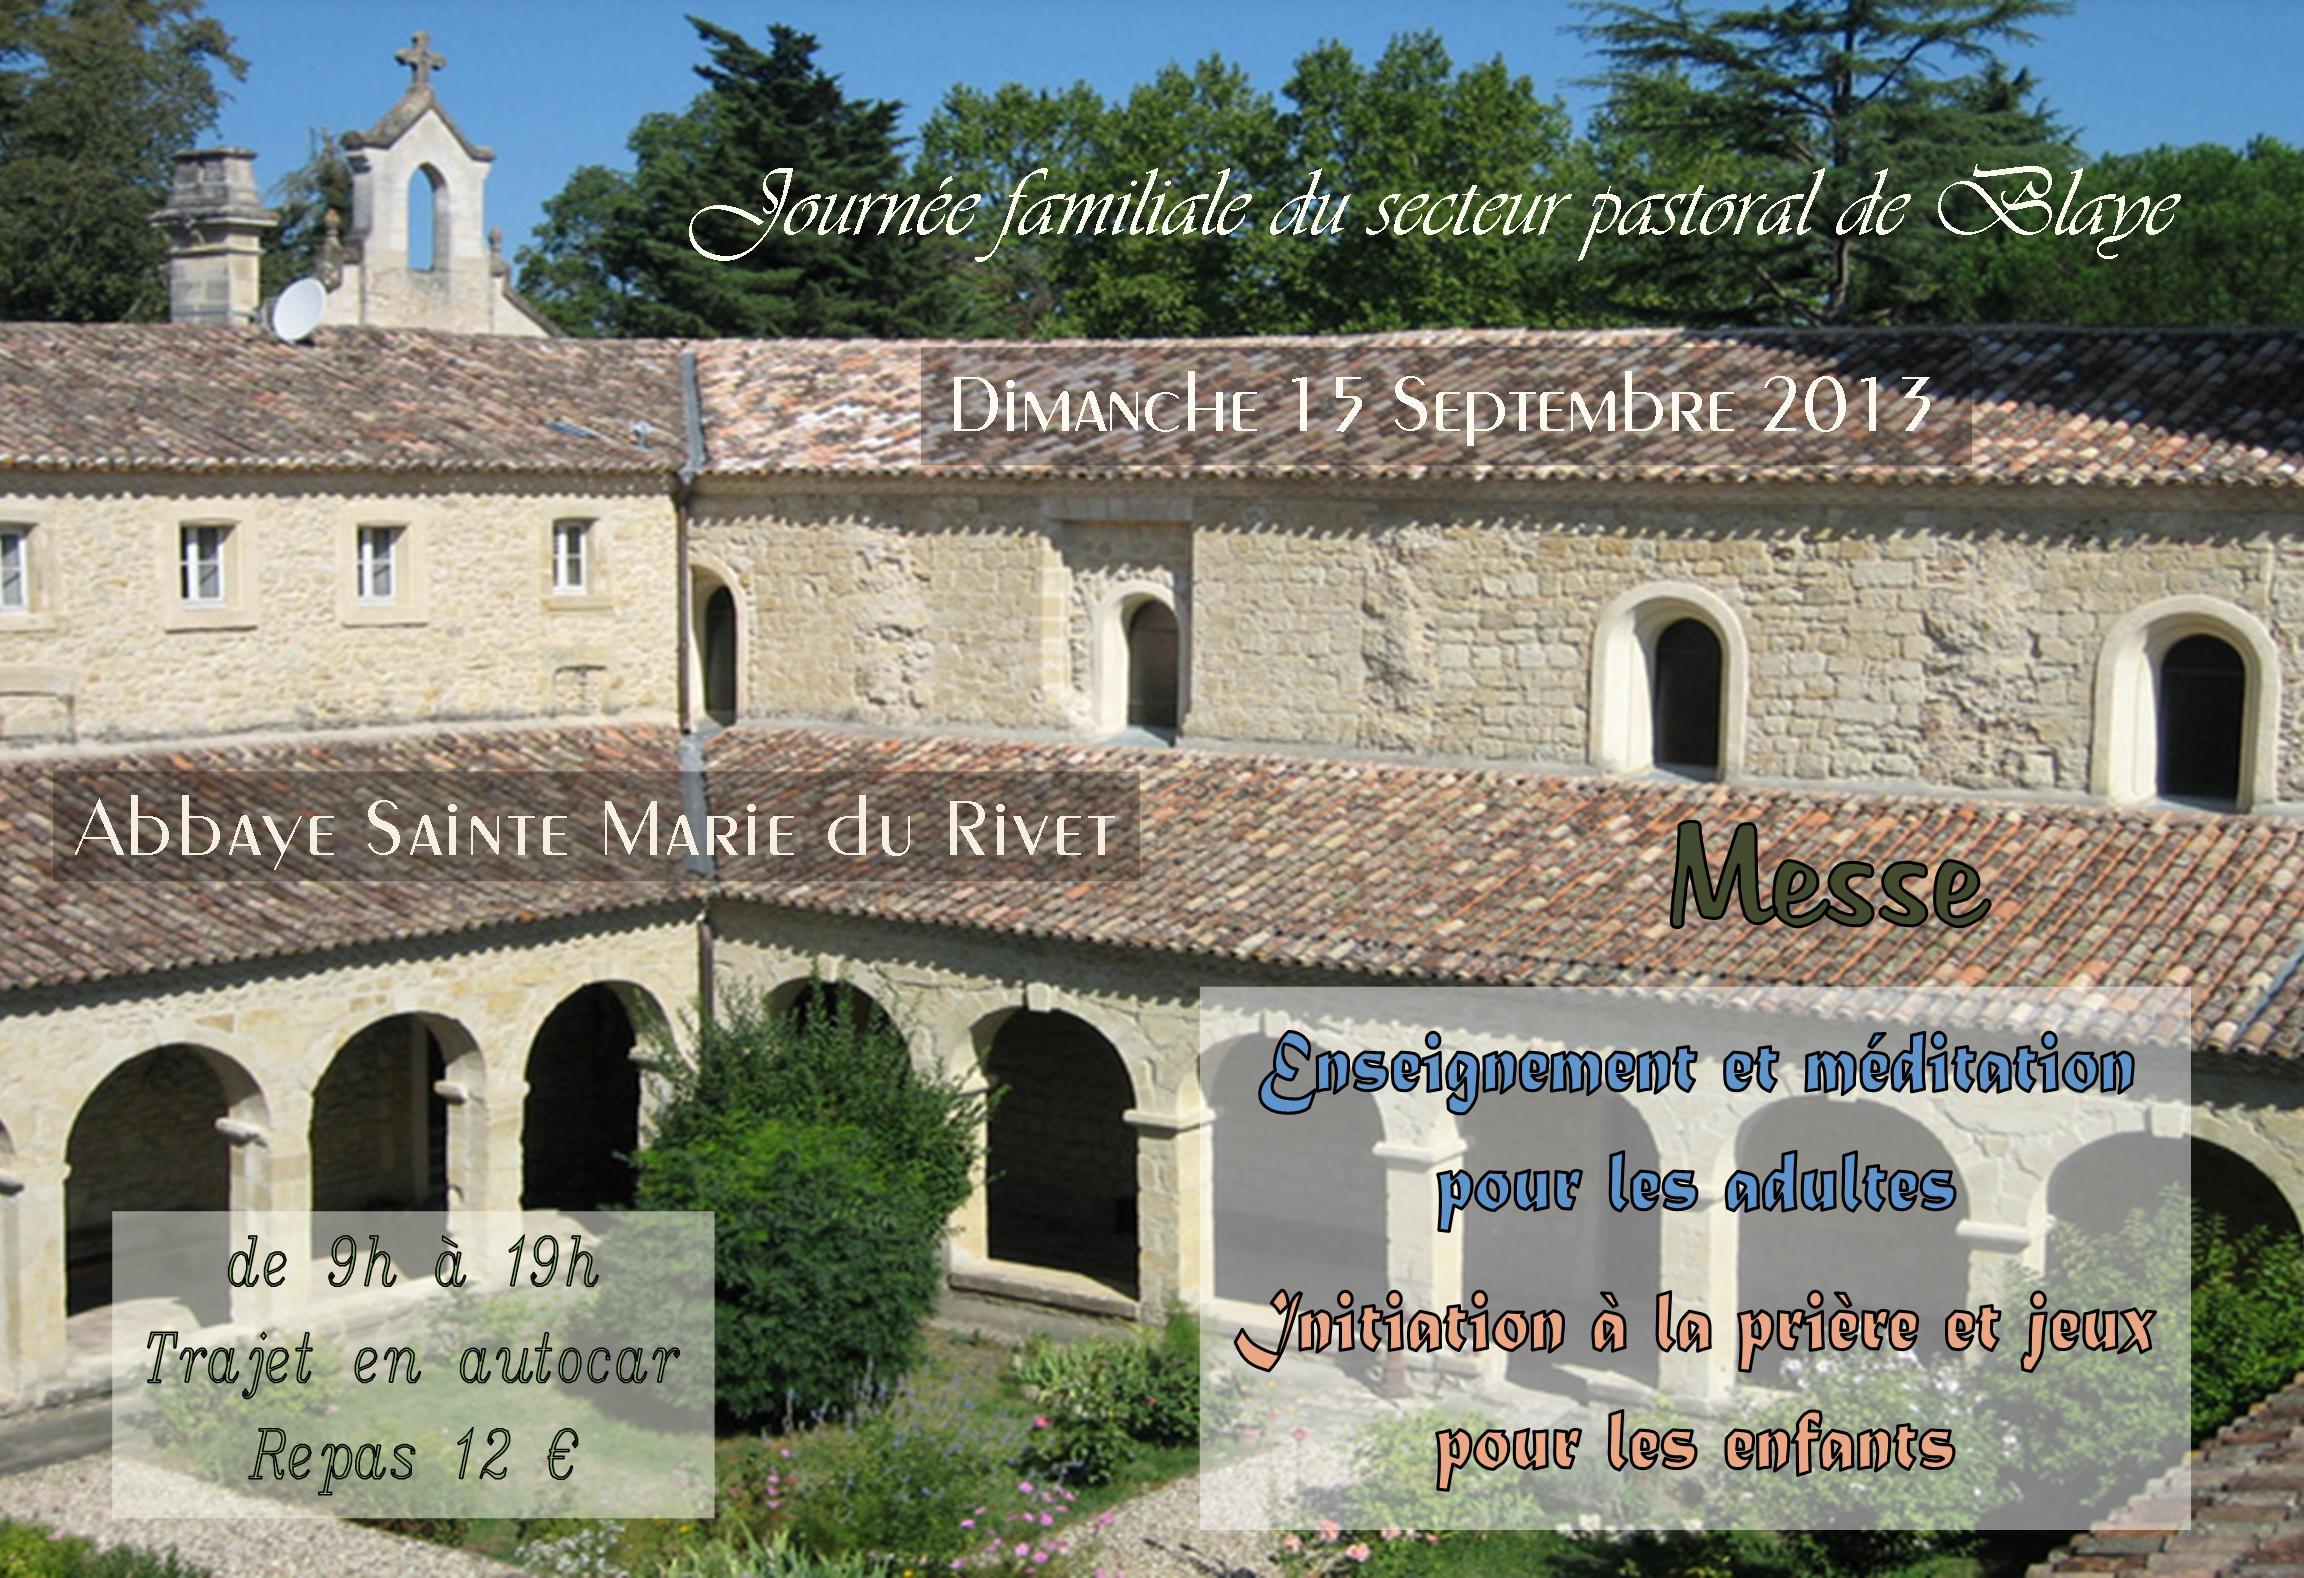 Journée Abbaye du Rivet 2013